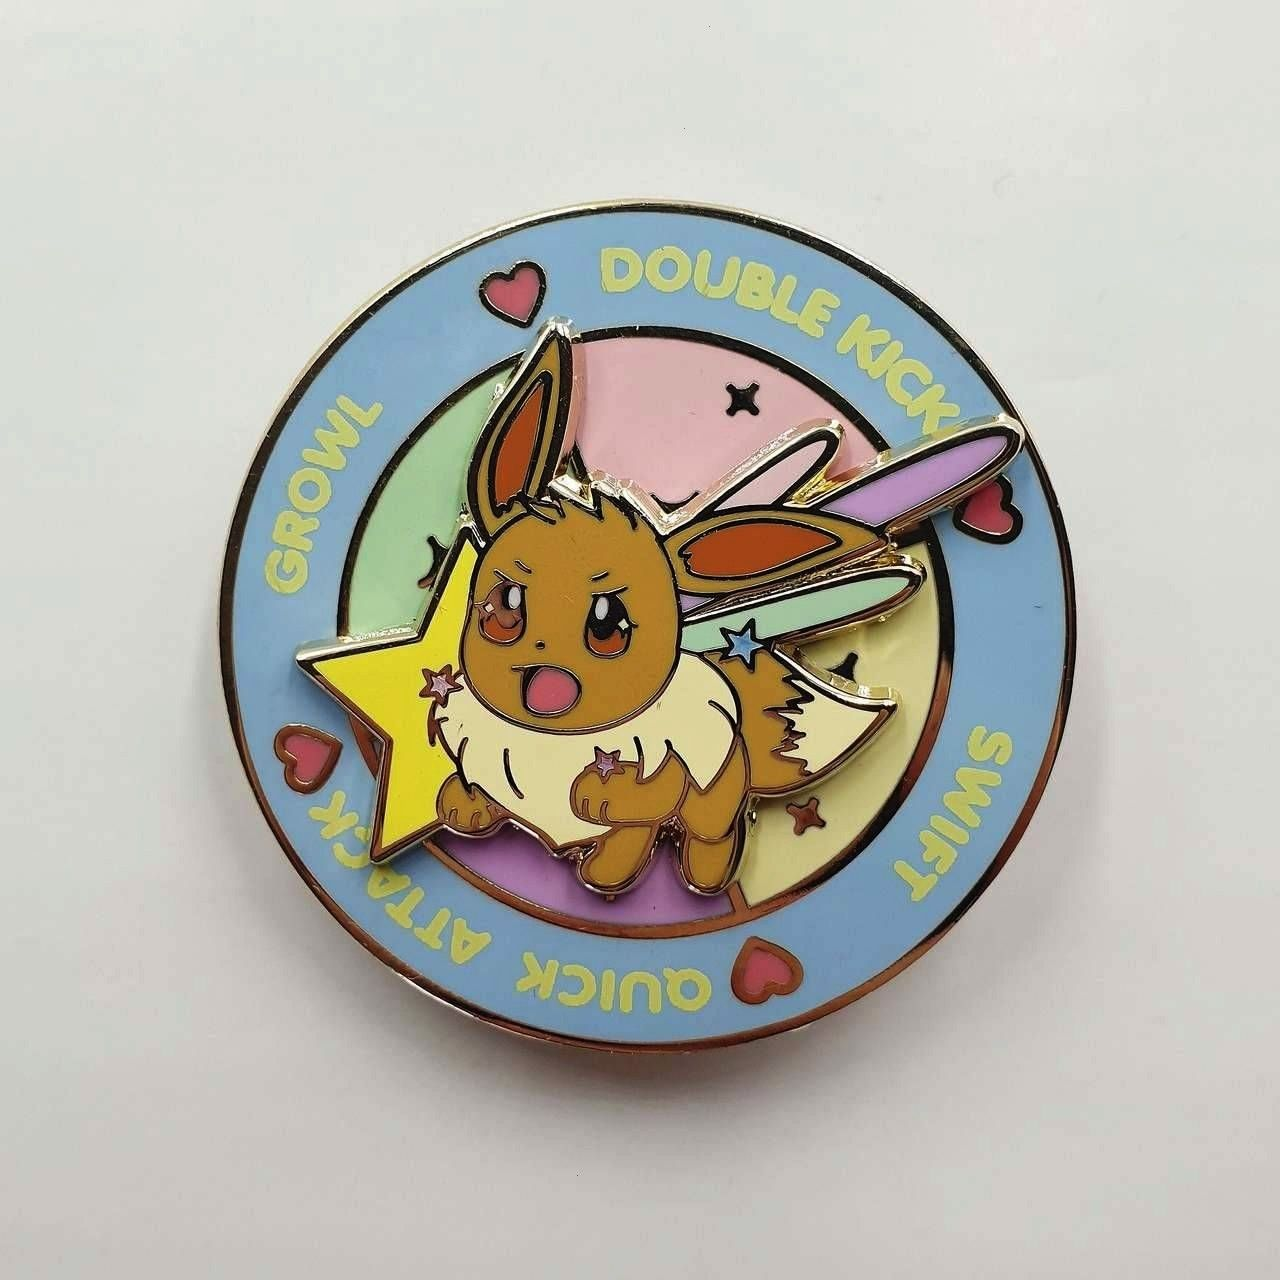 Pokemon Move Pins made by reallybigdill -Spinning Pokemon Move Pins made by reallybigdill -  New BC